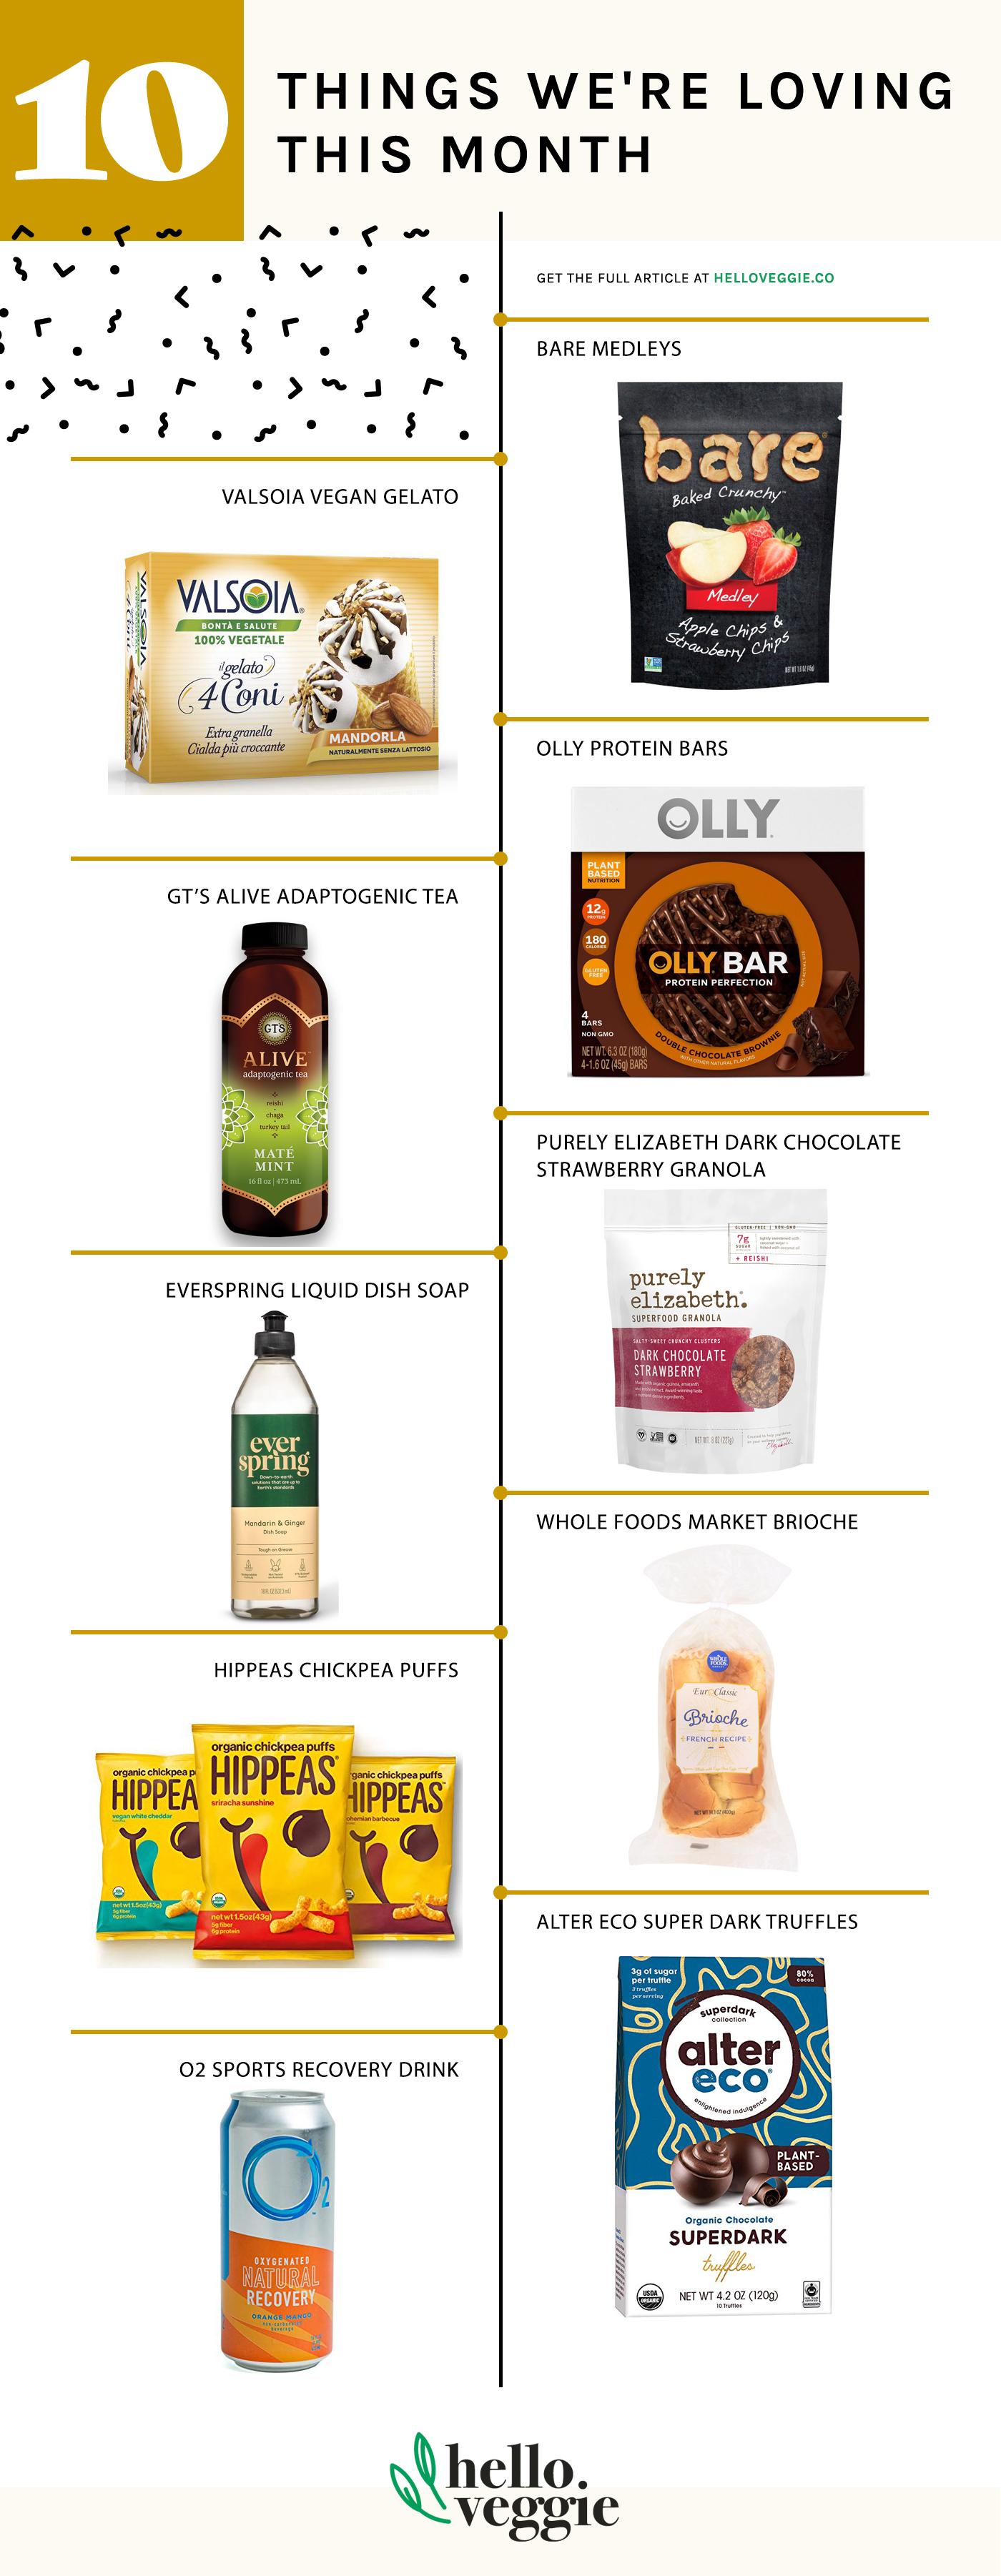 Vegan Gelato + 9 More Things We're Loving This Month